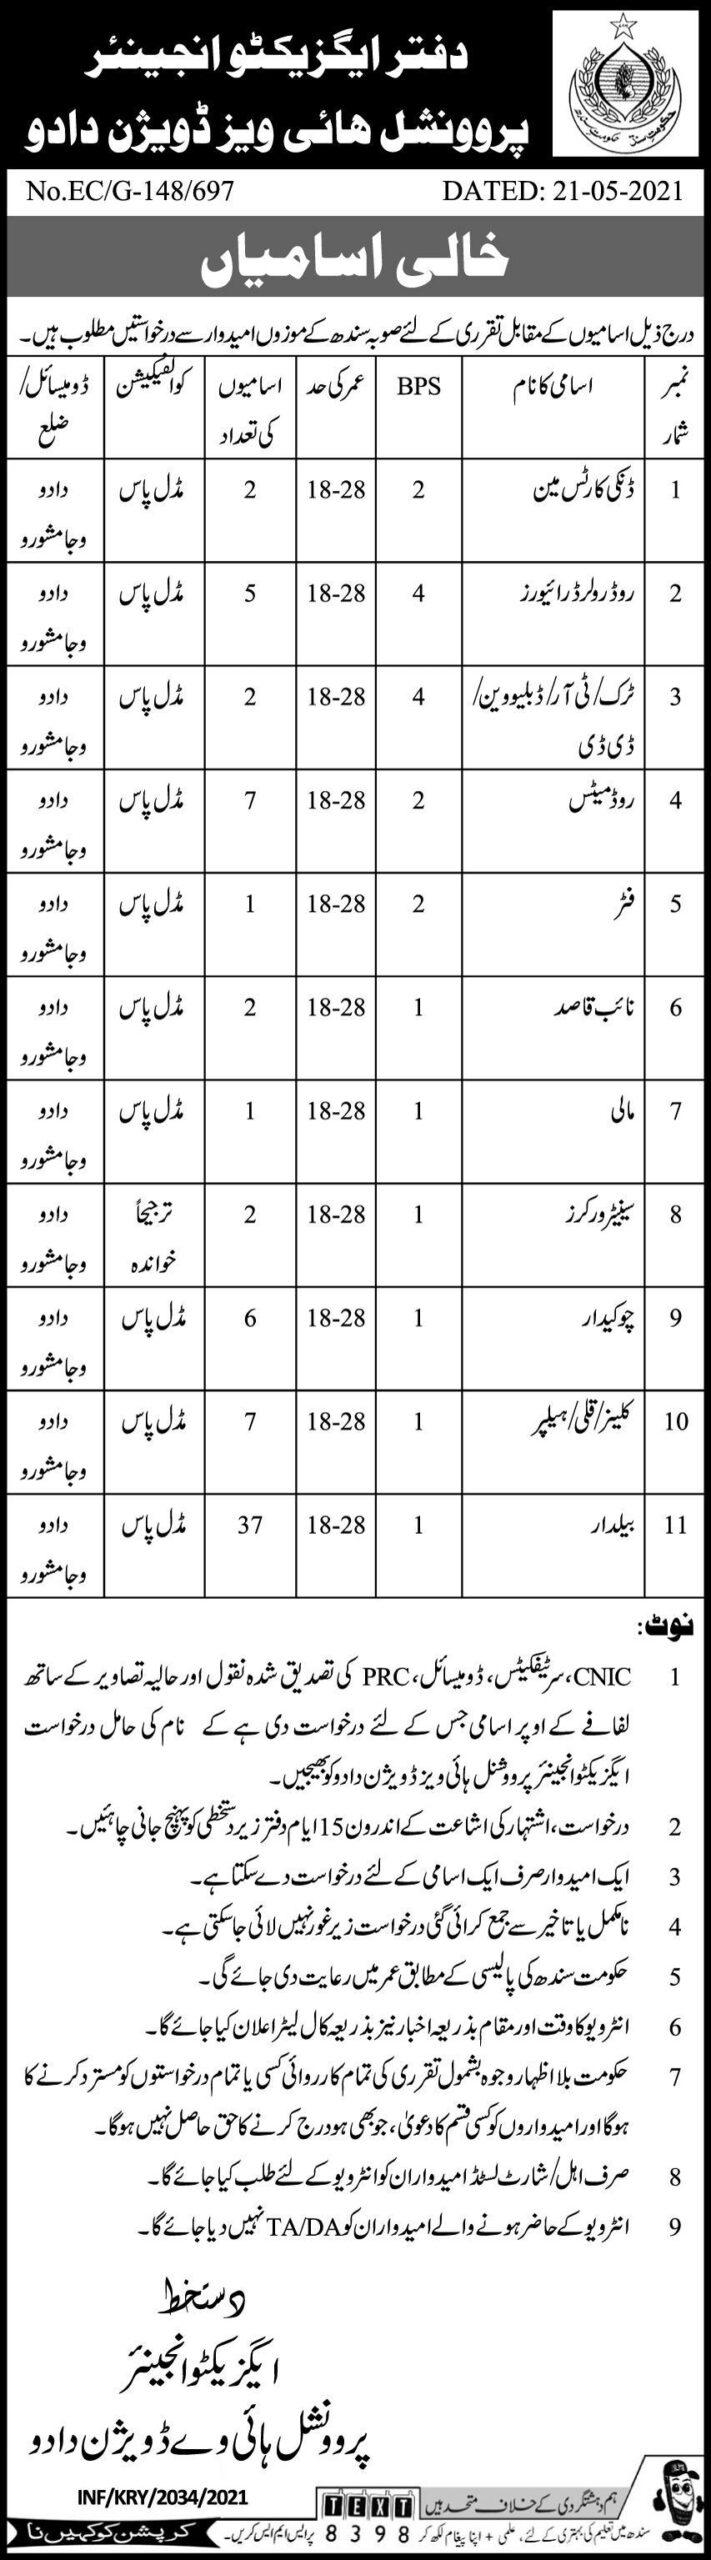 Provincial Highway Division Dadu Latest Jobs 2021 (72 Posts)